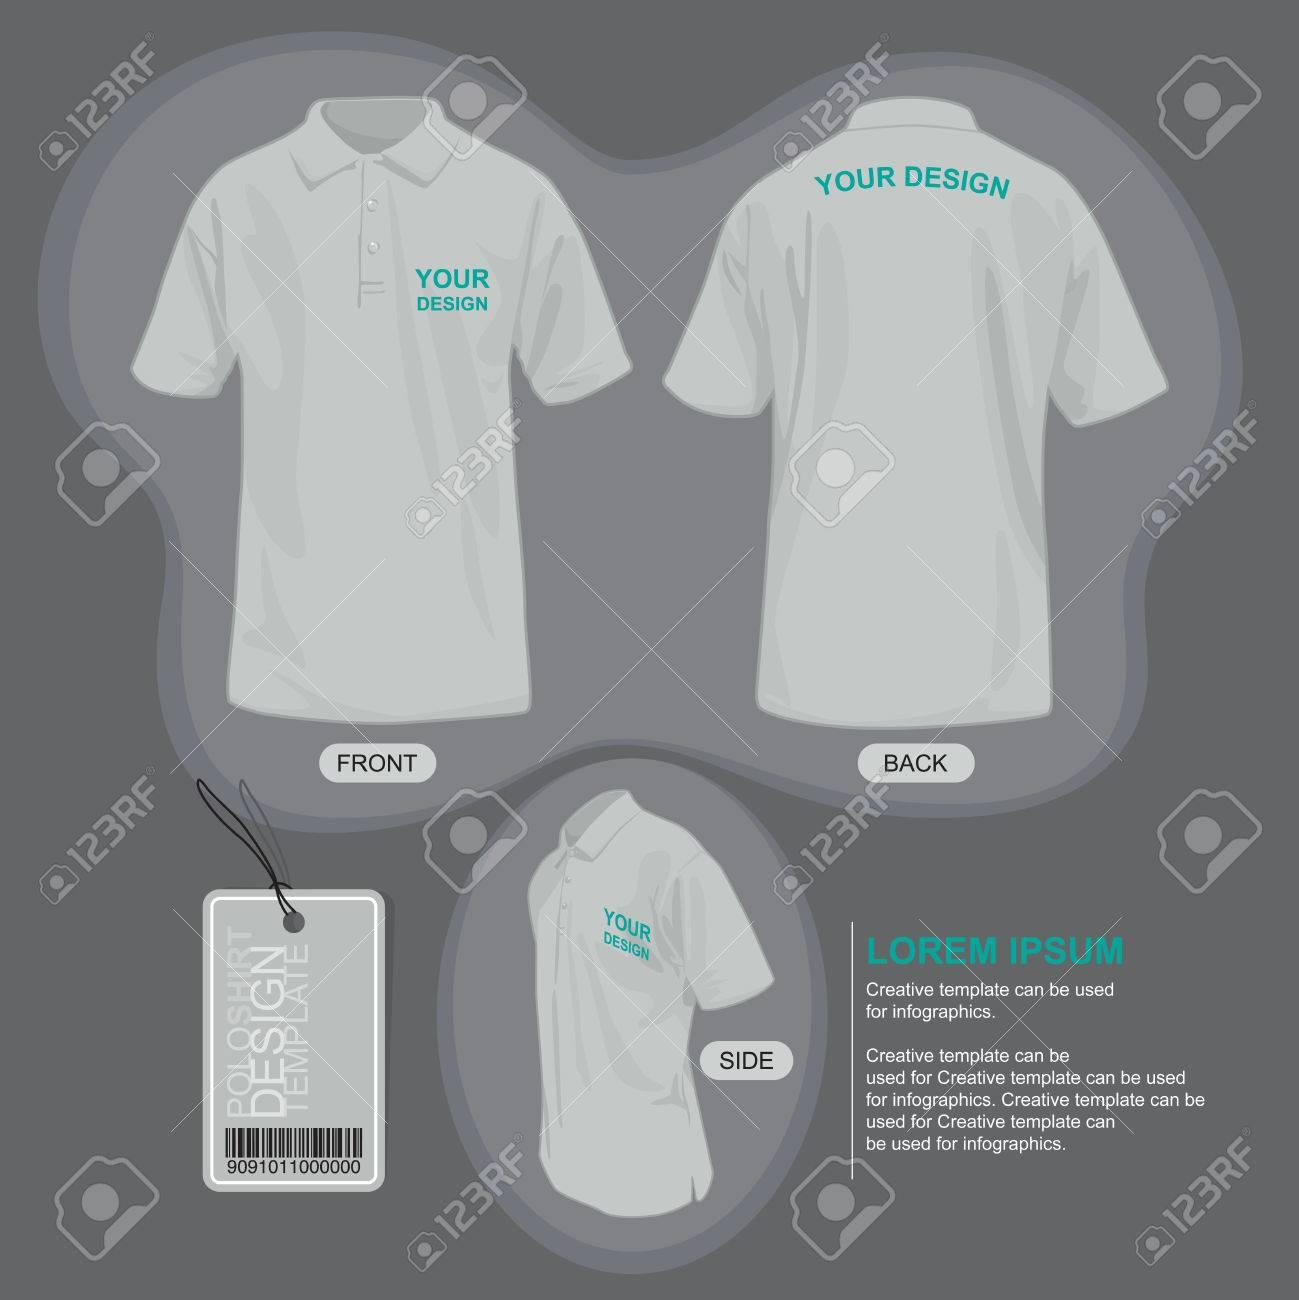 Shirt uniform design vector - Polo Shirt Uniform Template Illustration By Vector Design Stock Vector 49303569